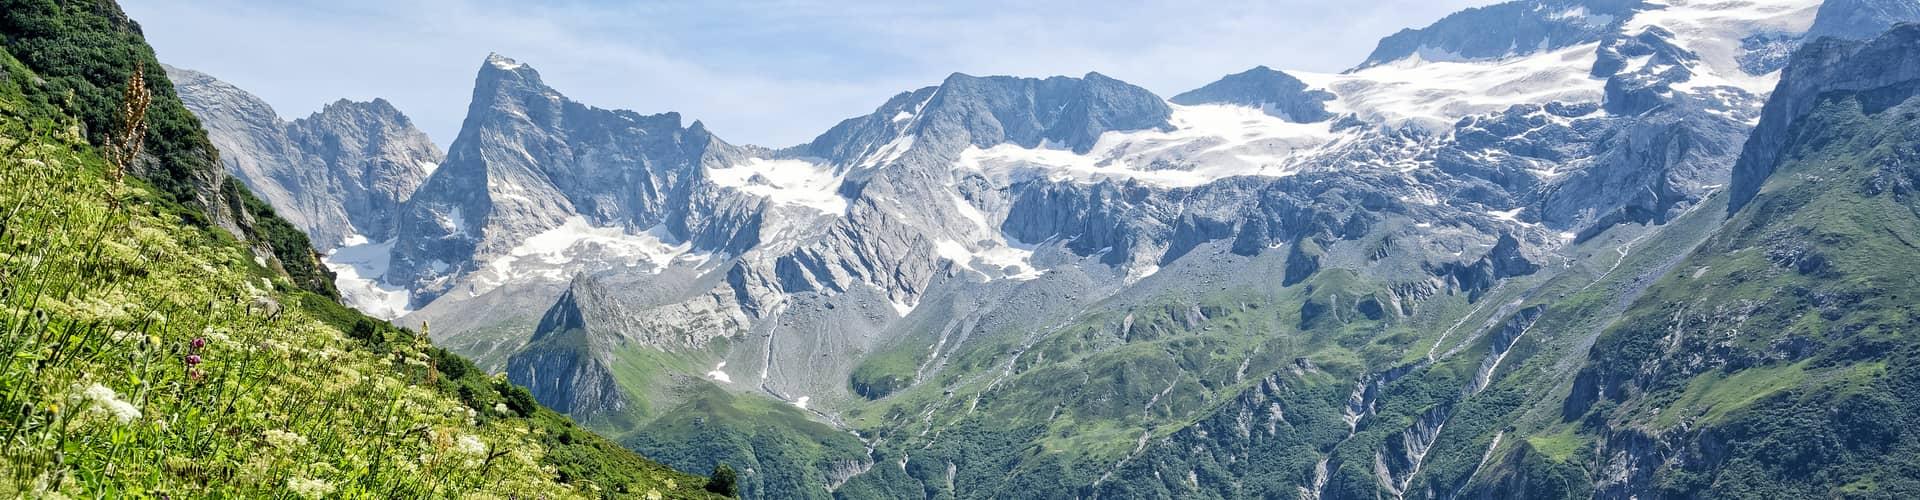 Kamperen in Auvergne-Rhône-Alpes